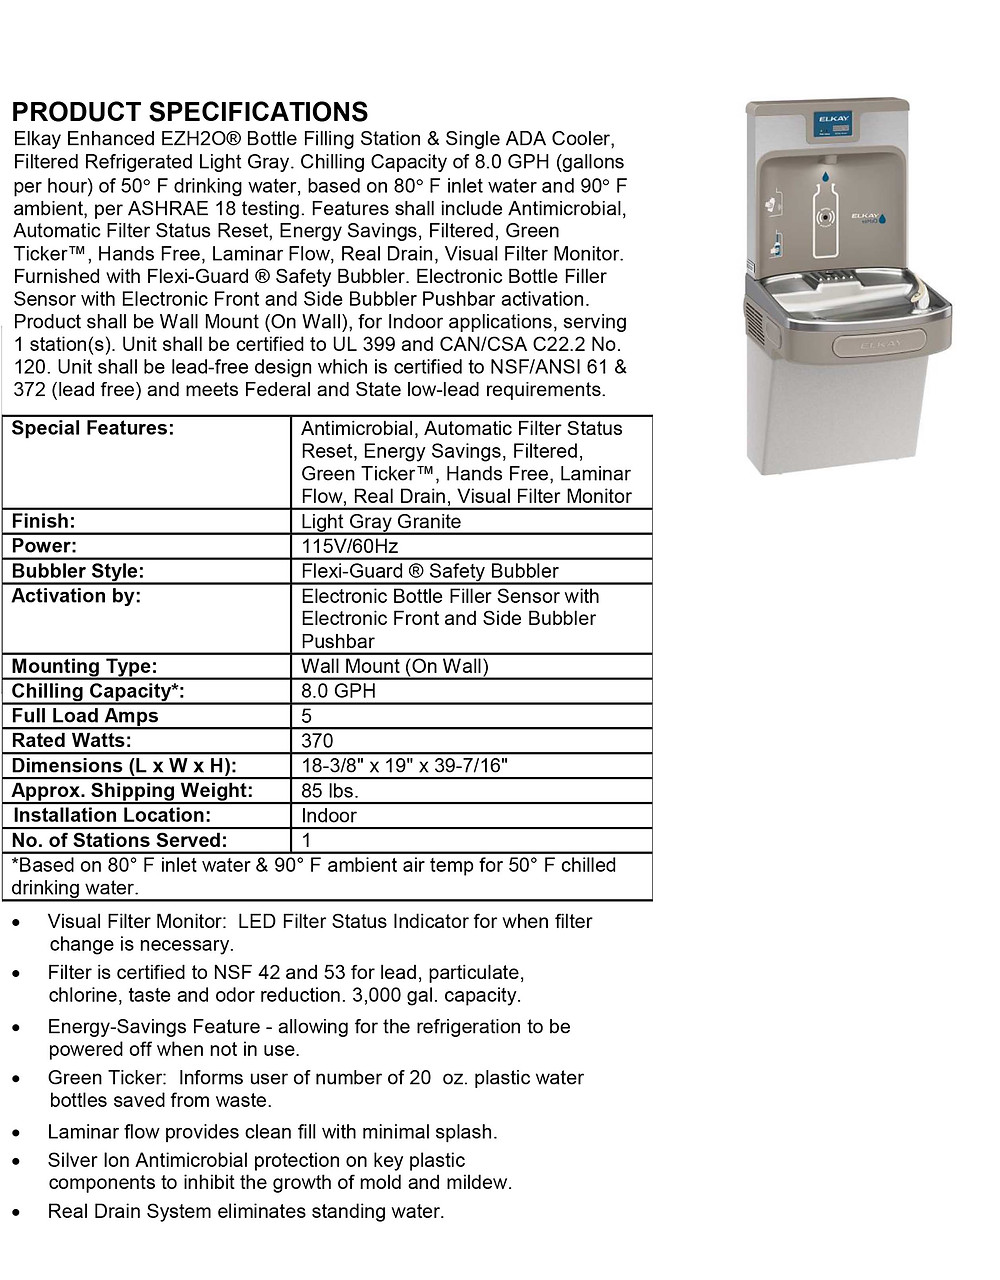 LZS8WSLP Elkay Enhanced EZH2O Bottle Filling Station Specifications